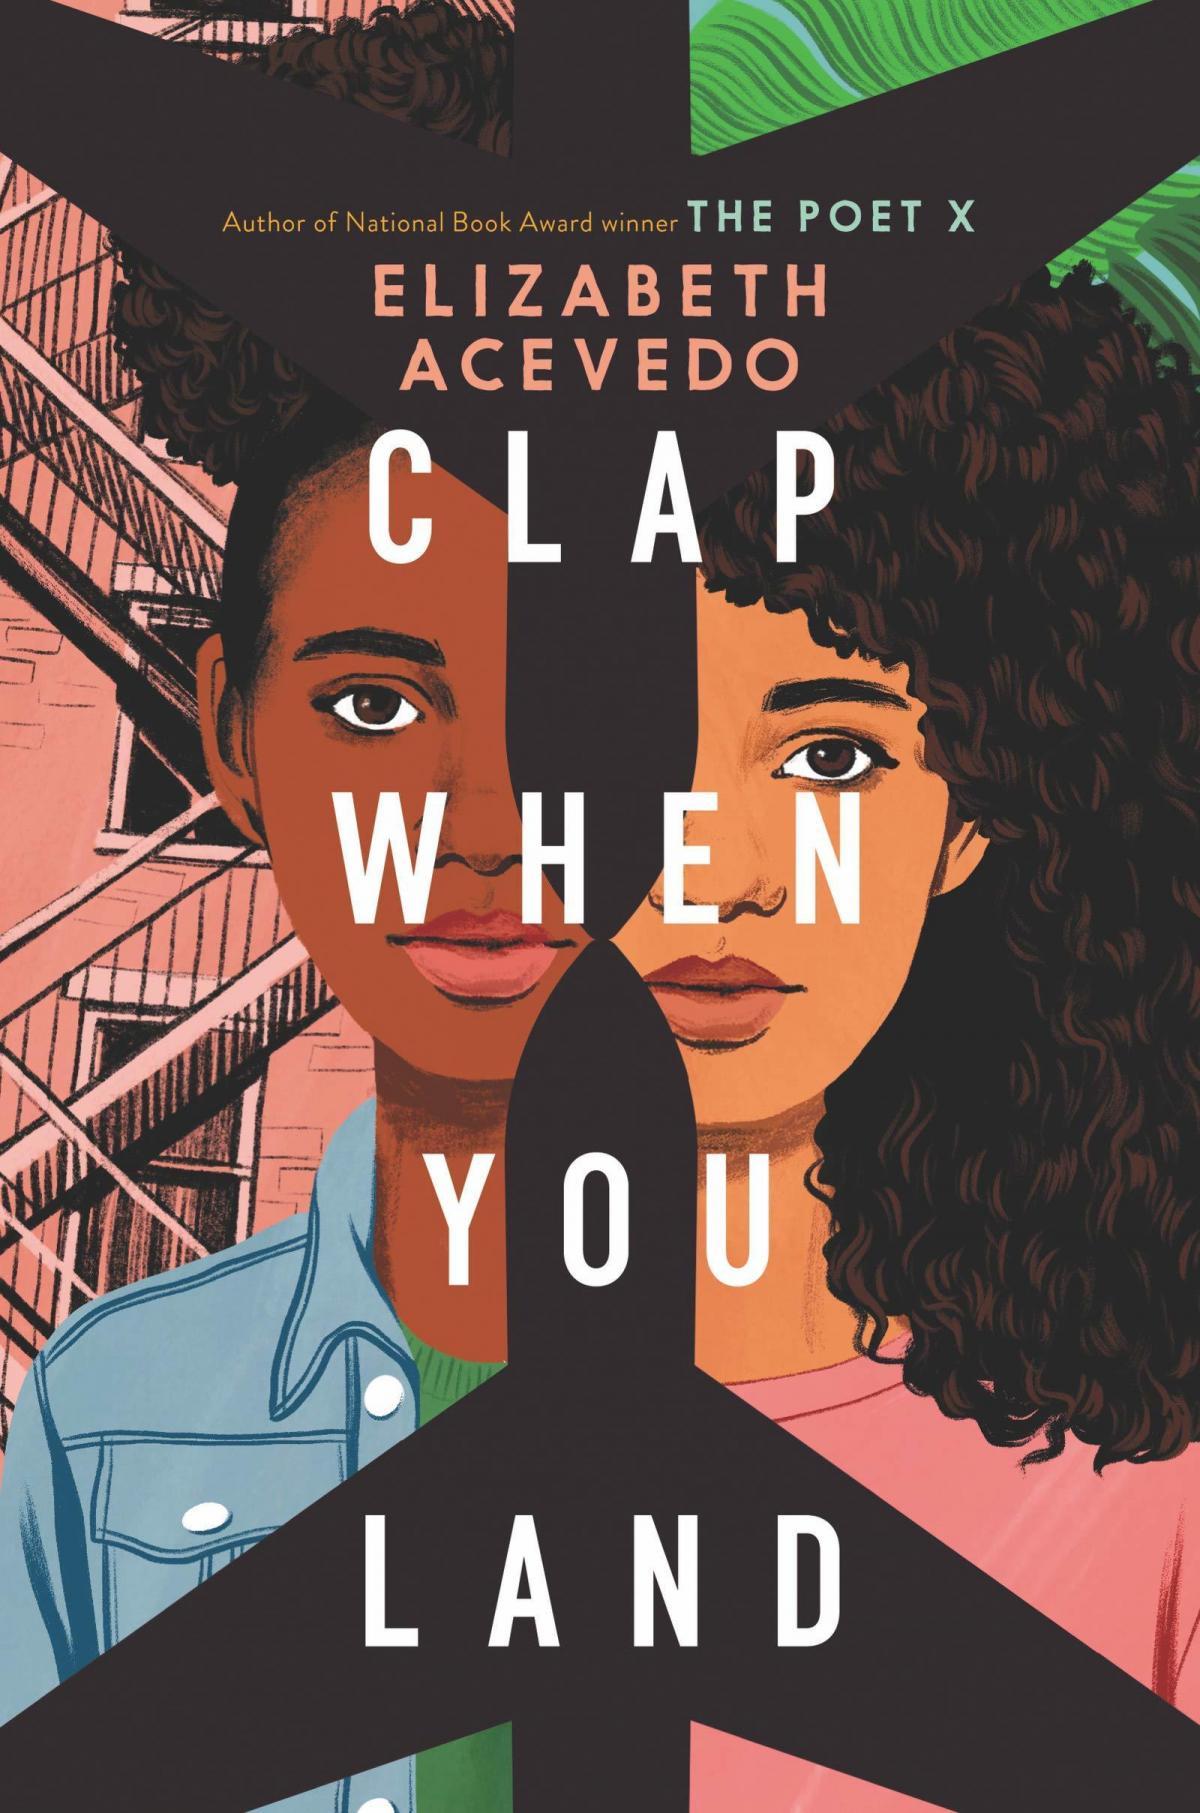 Clap When You Land, by Elizabeth Acevedo